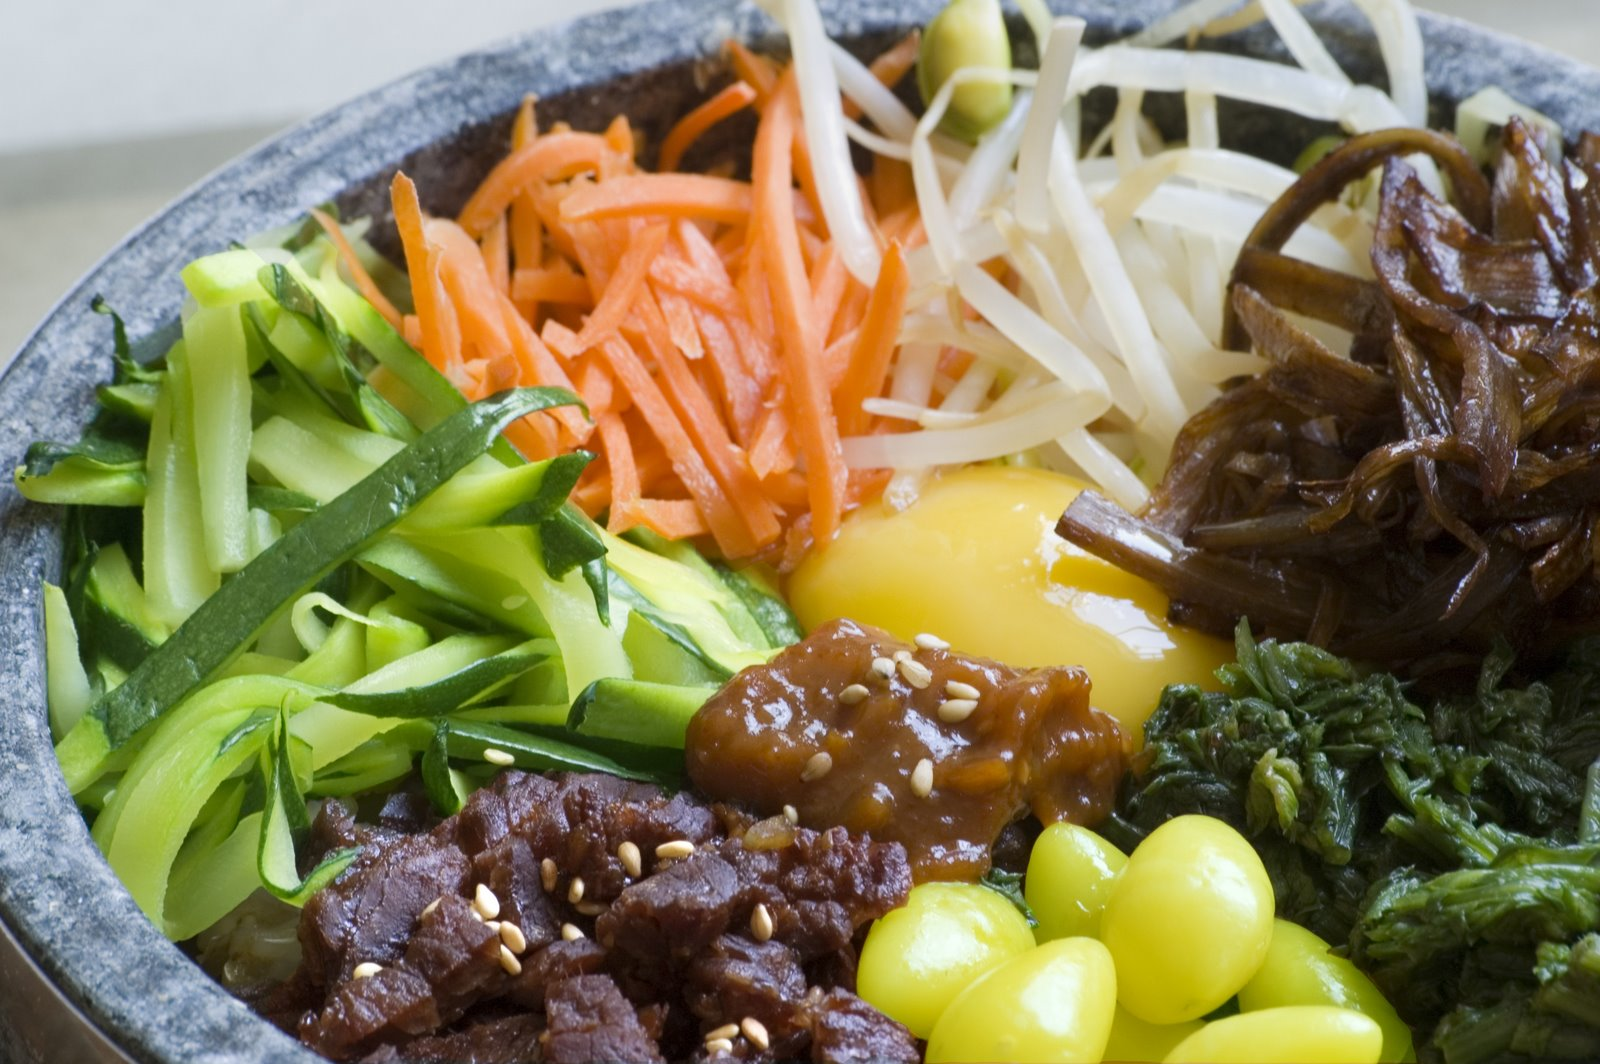 Recette du bibimbap for Cuisine coreenne